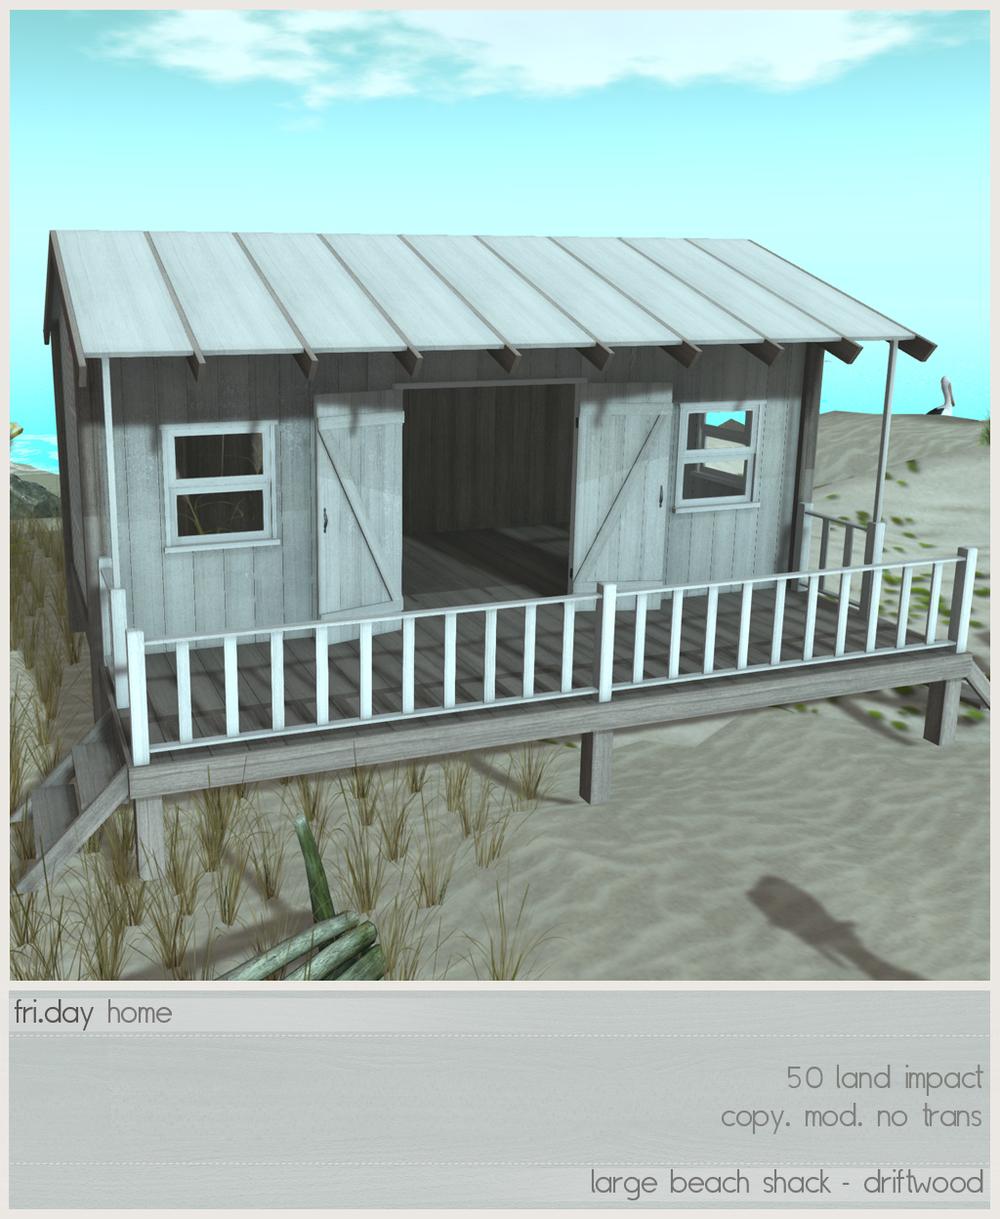 frihome - large beach shack - driftwood ad.jpg